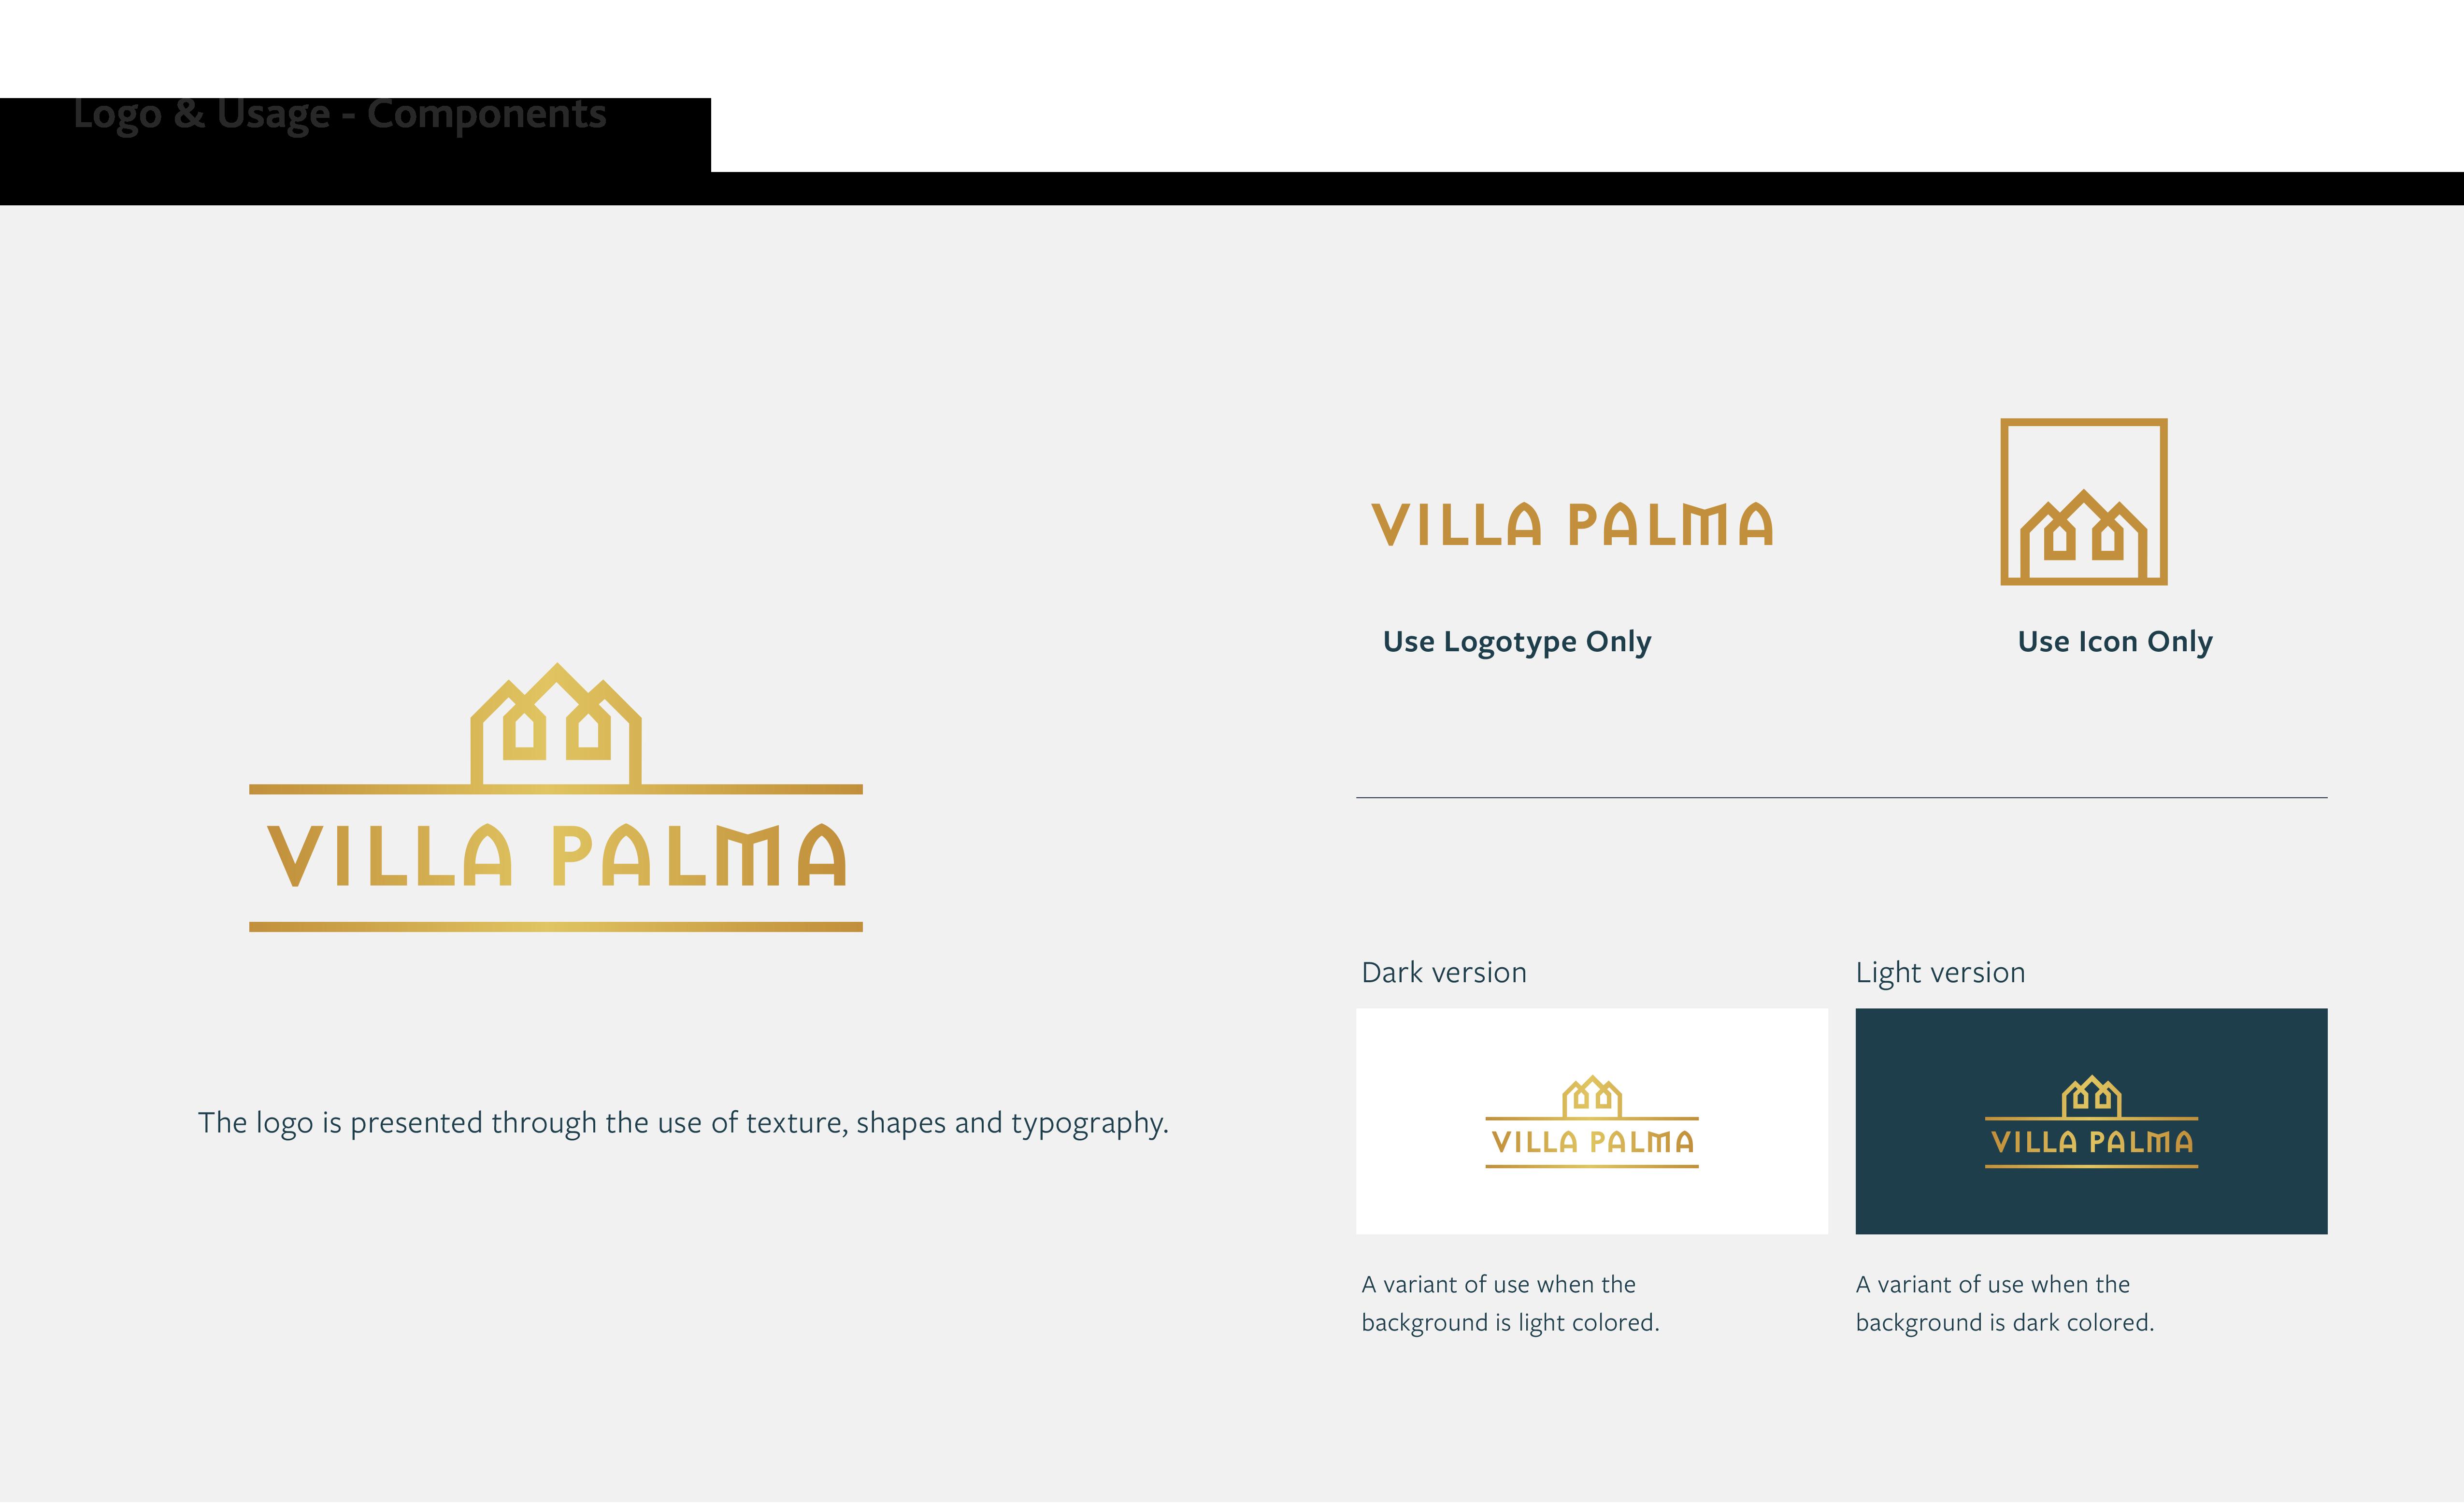 VillaPalma Logo Components